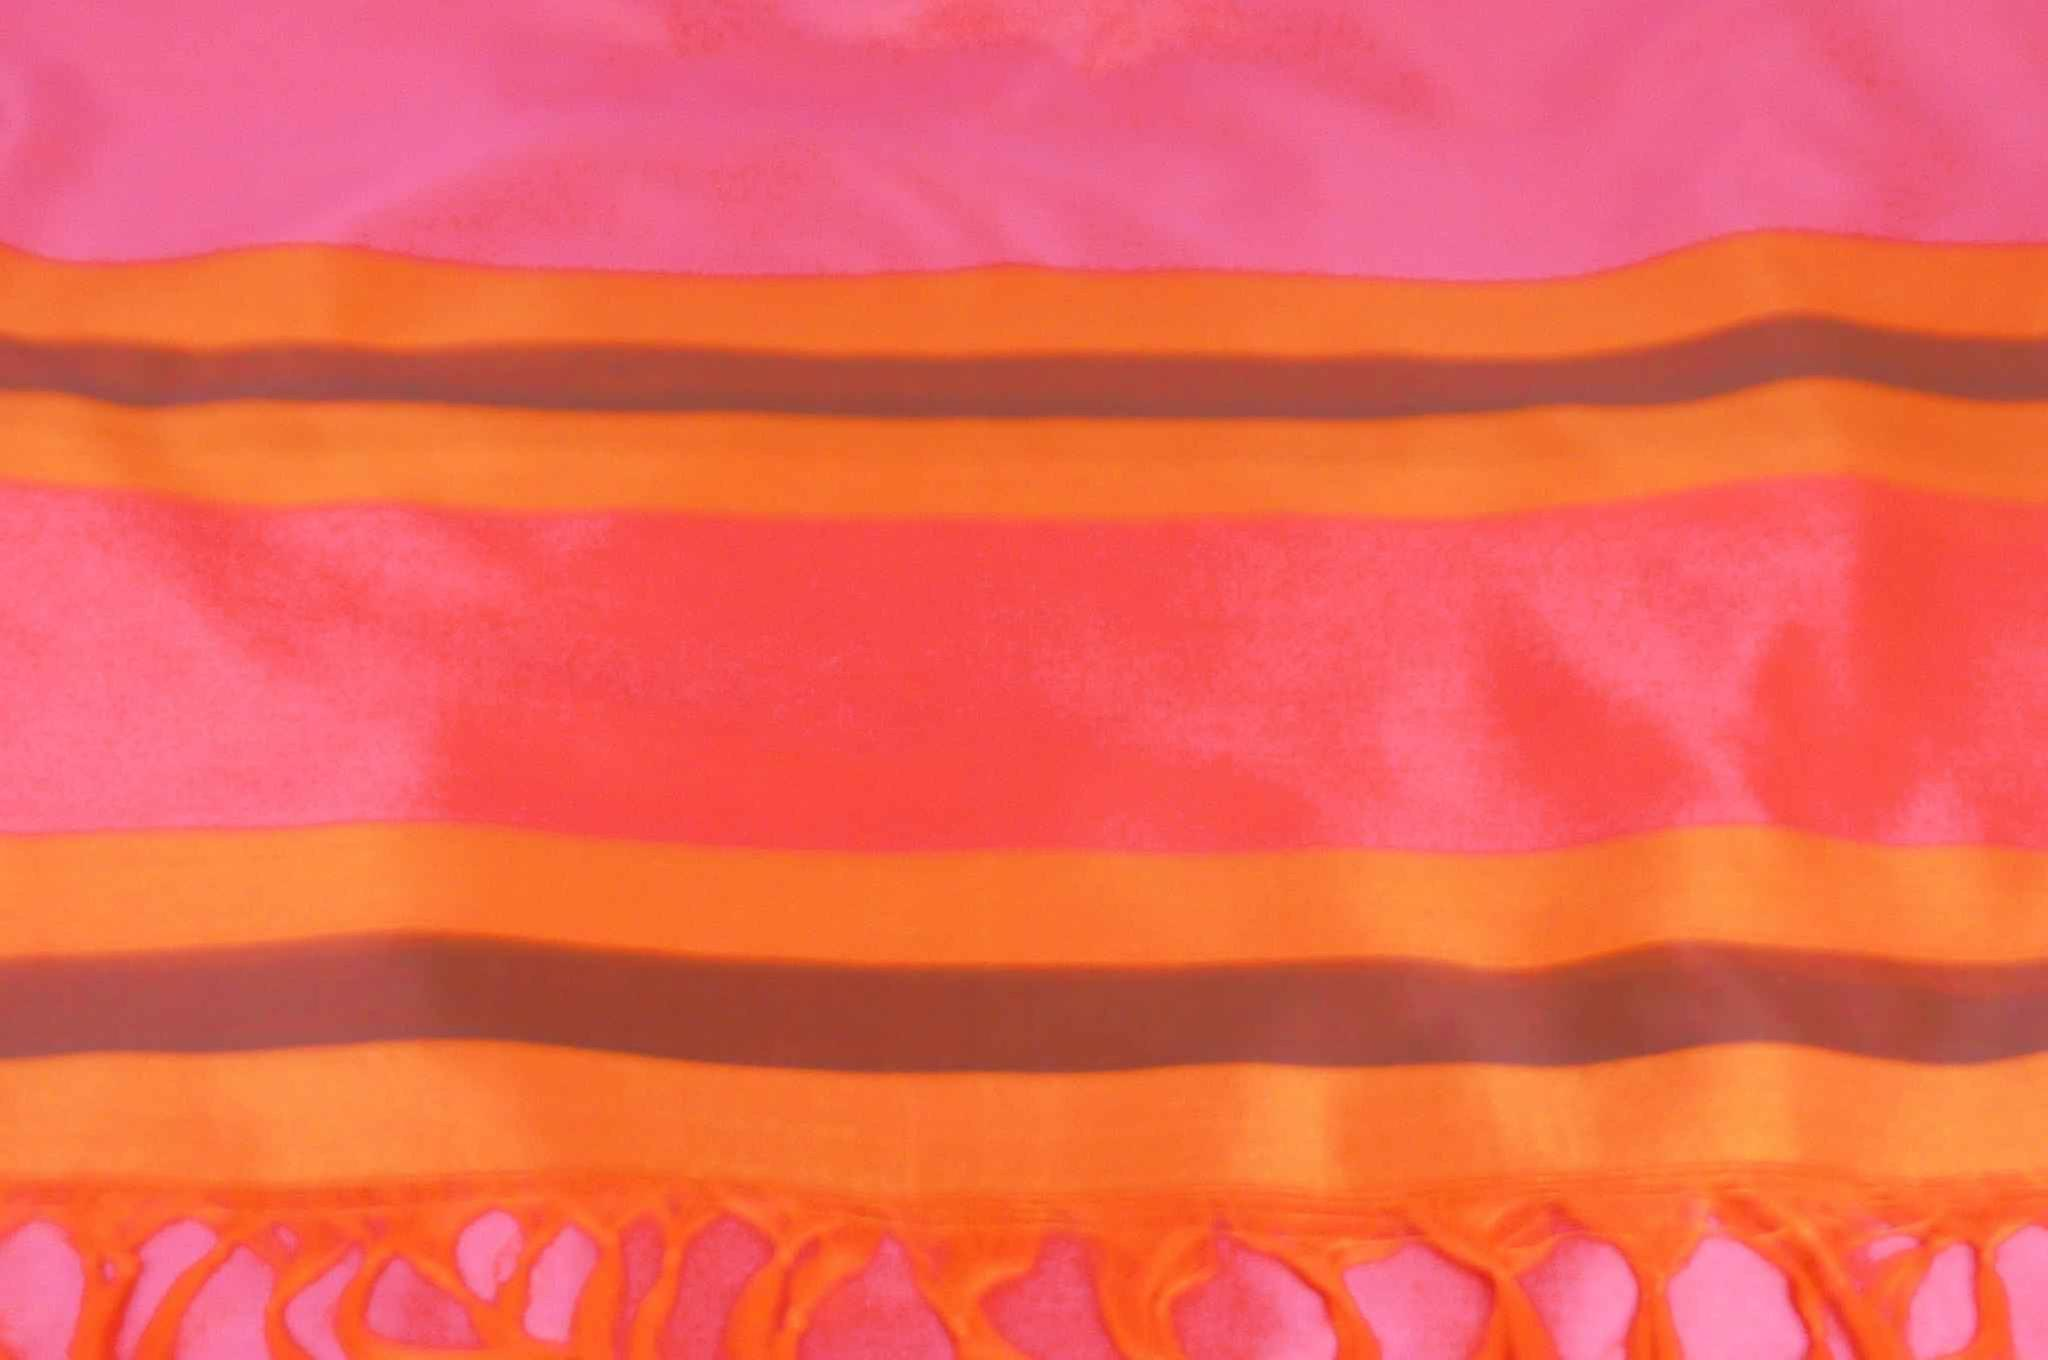 Varanasi Border Prime Silk Long Scarf Heritage Ganguly 909 by Pashmina & Silk